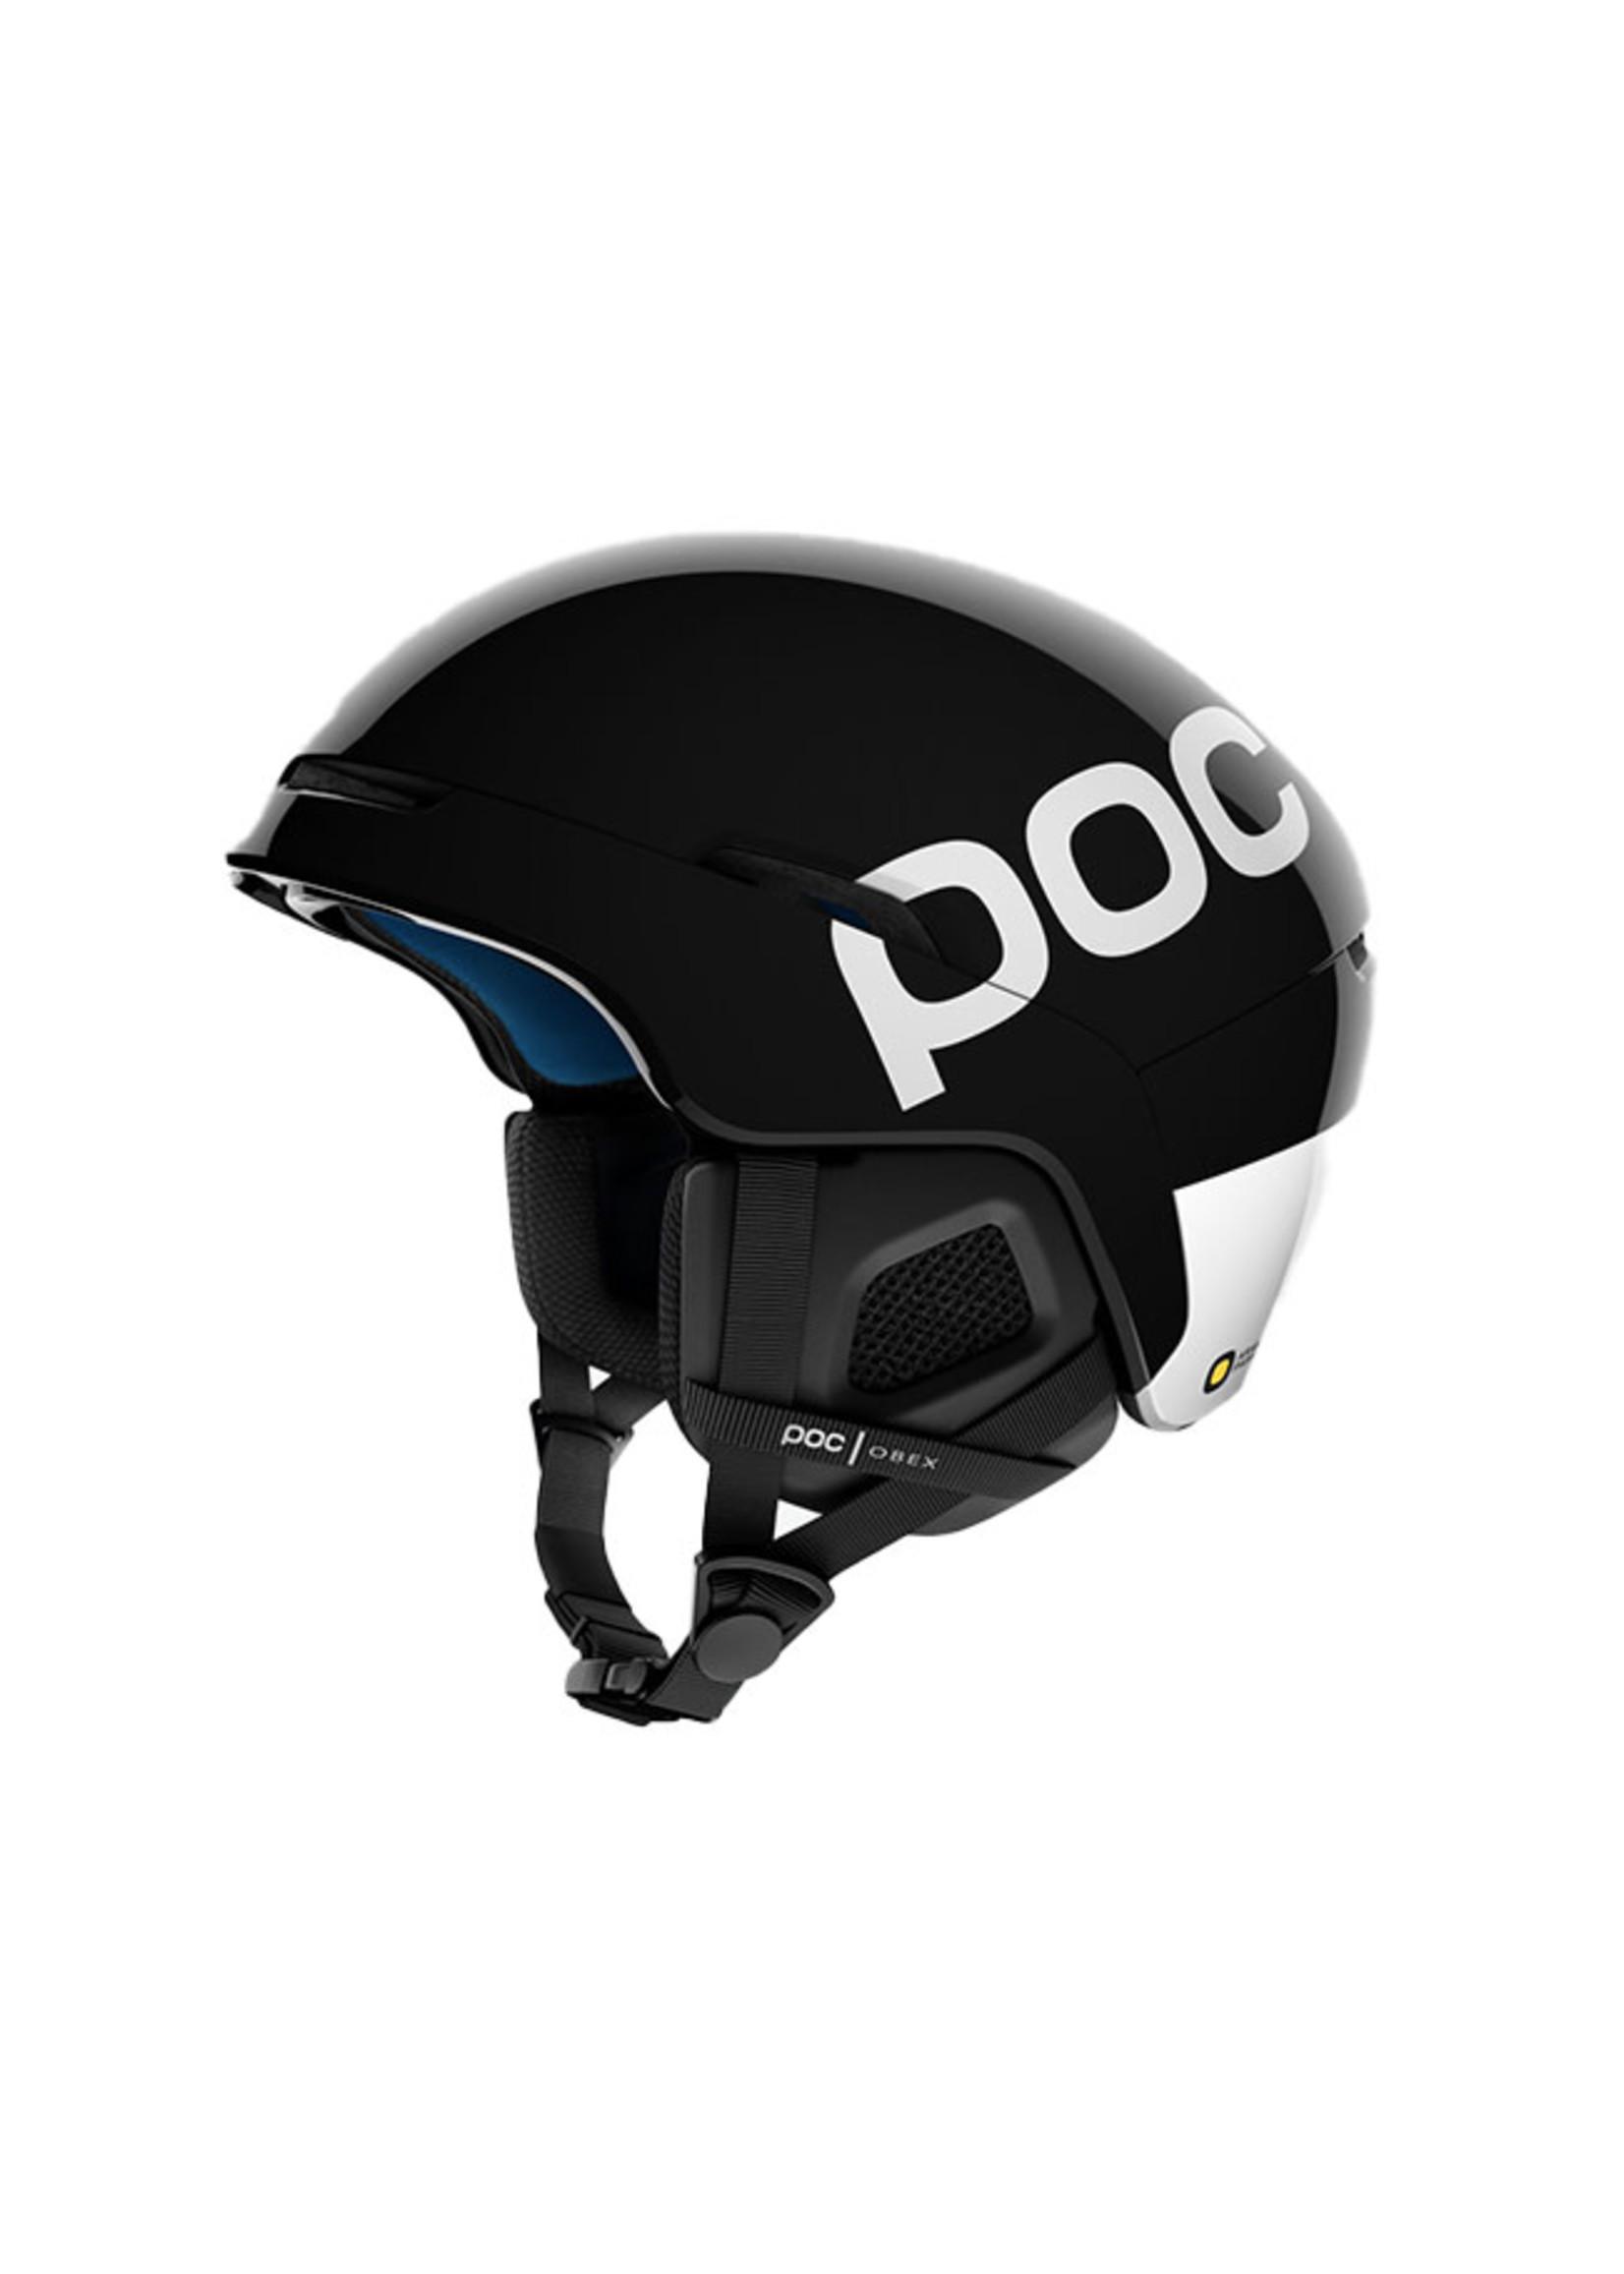 POC Touring Helmet Obex BC Spin